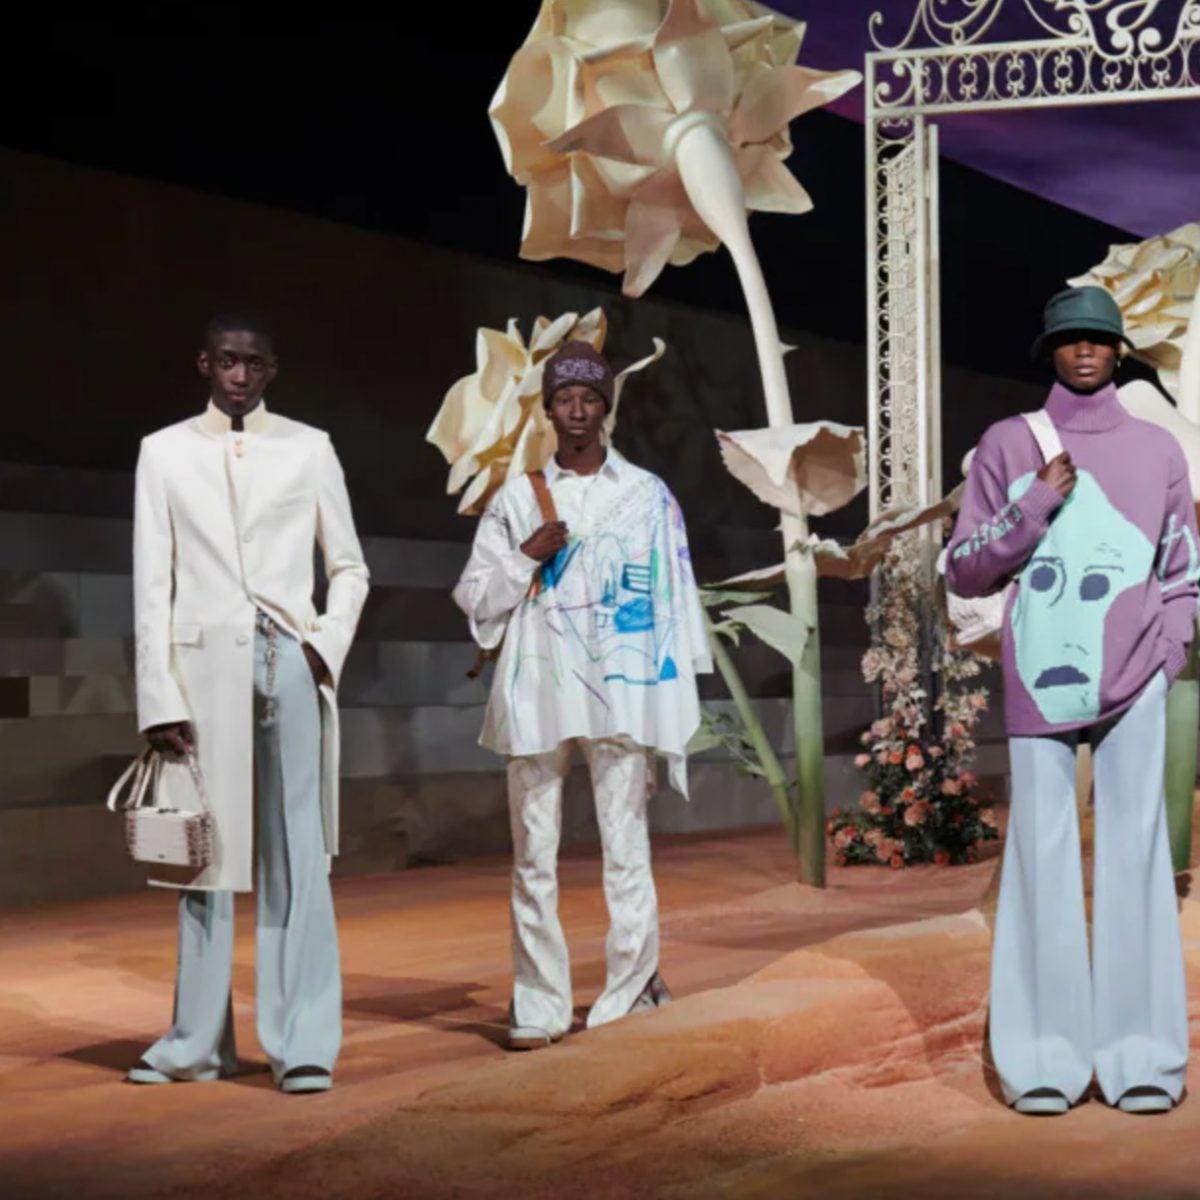 Travis Scott's Dior Collection Cactus Jack Was A Runway Rager